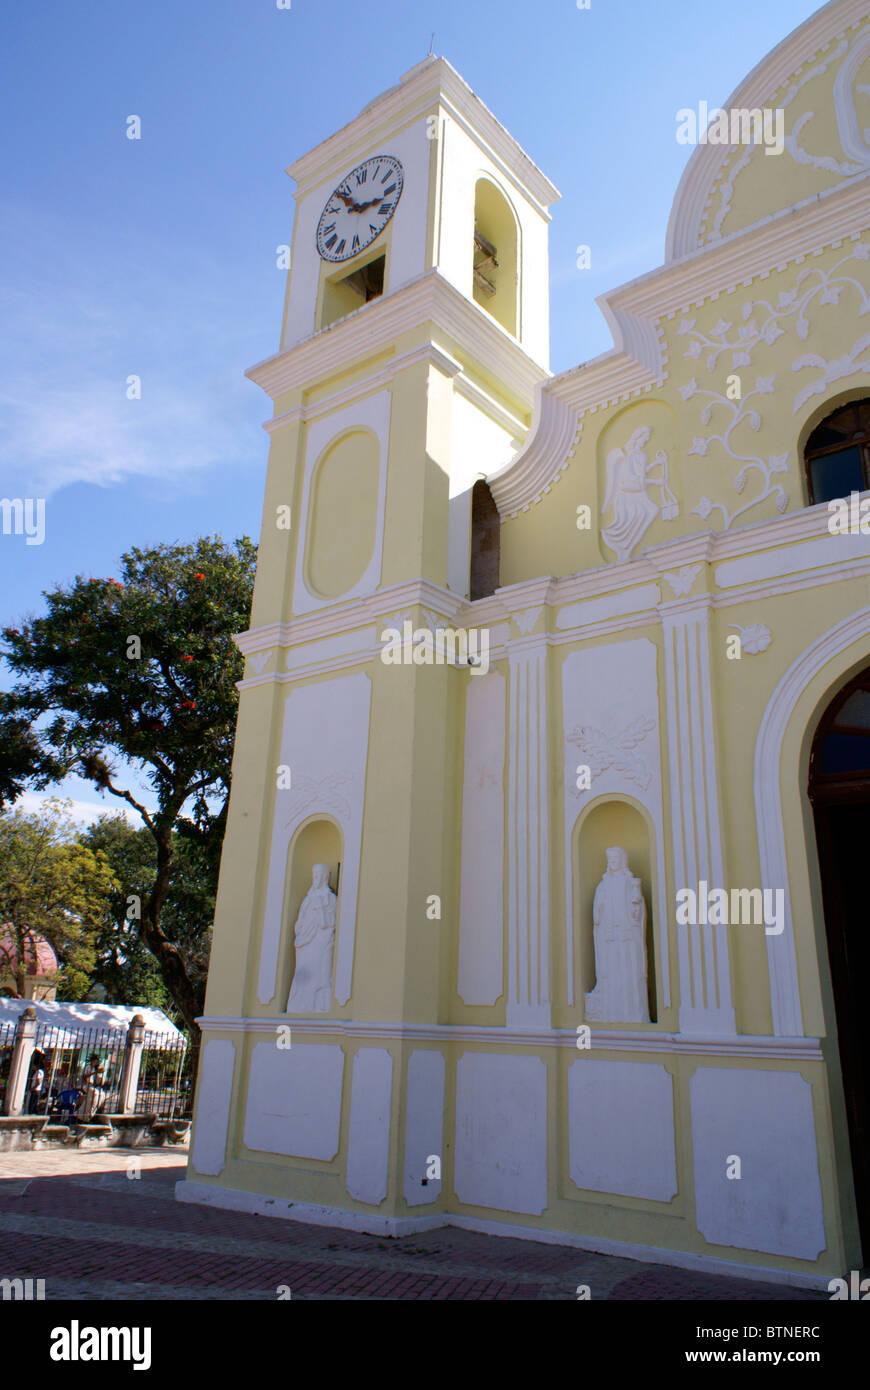 Iglesia De San Marcos Photos & Iglesia De San Marcos Images - Alamy